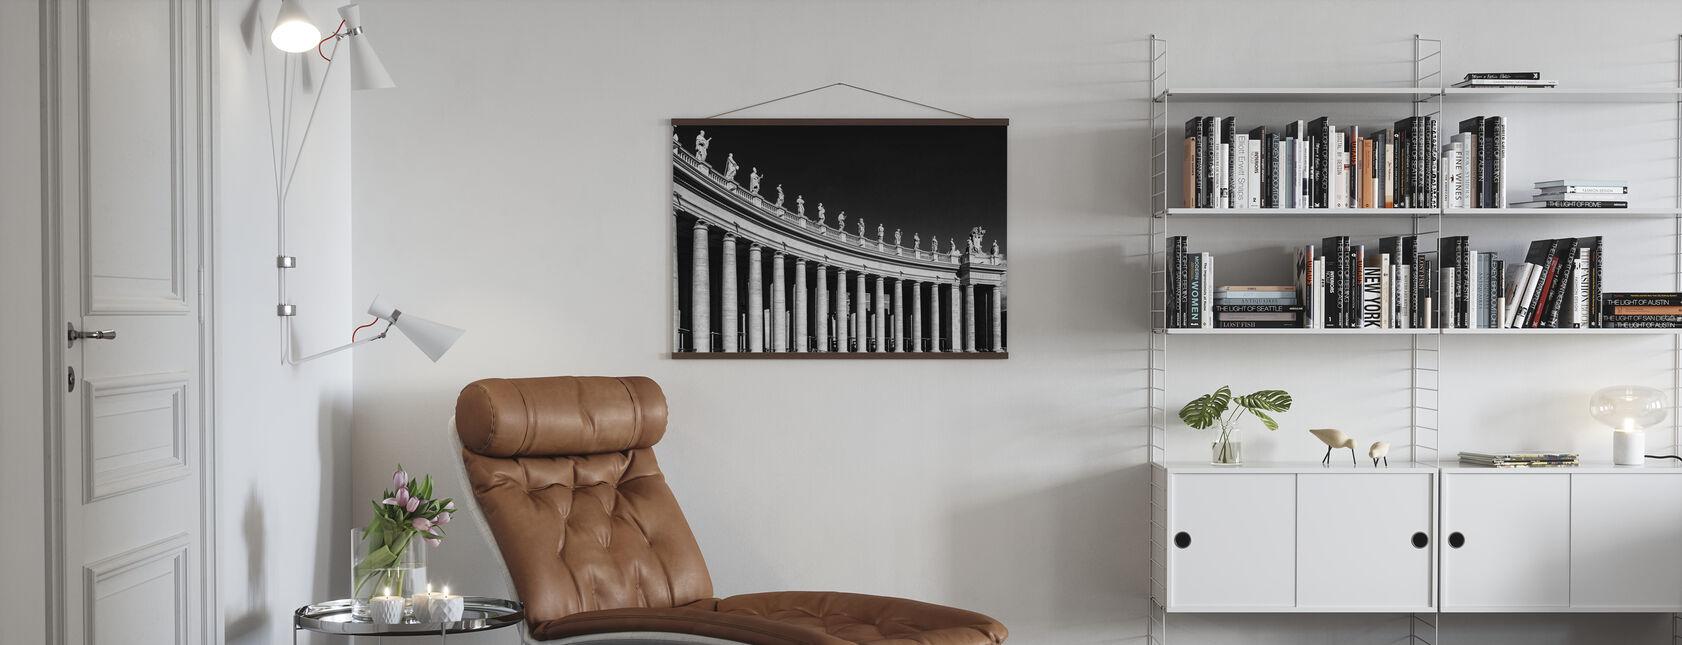 Kolonneformet skulptur - Plakat - Stue